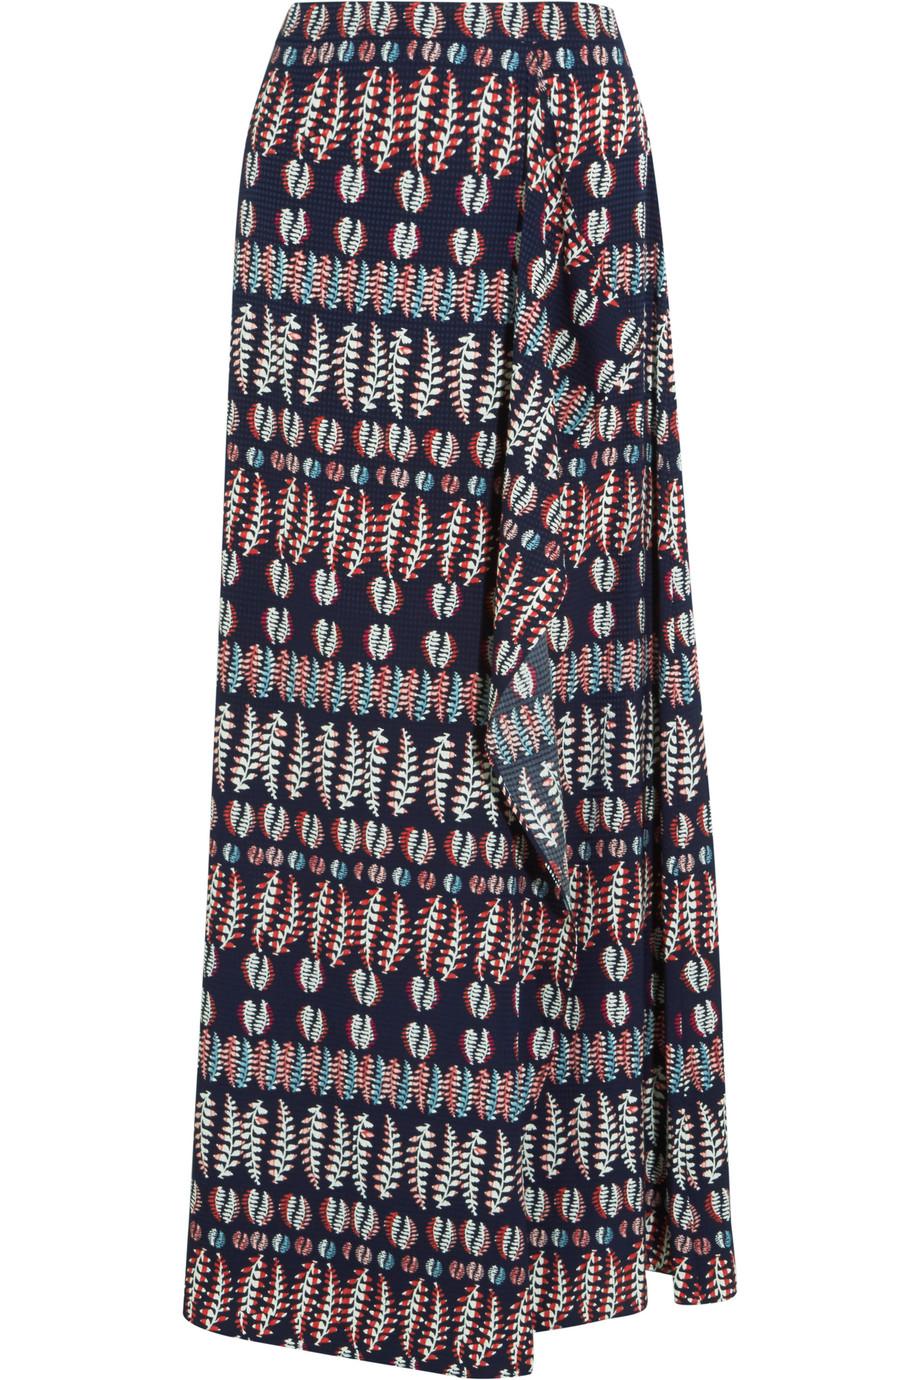 Tory Burch Printed Stretch-Silk Satin Maxi Skirt, Navy, Women's, Size: 2